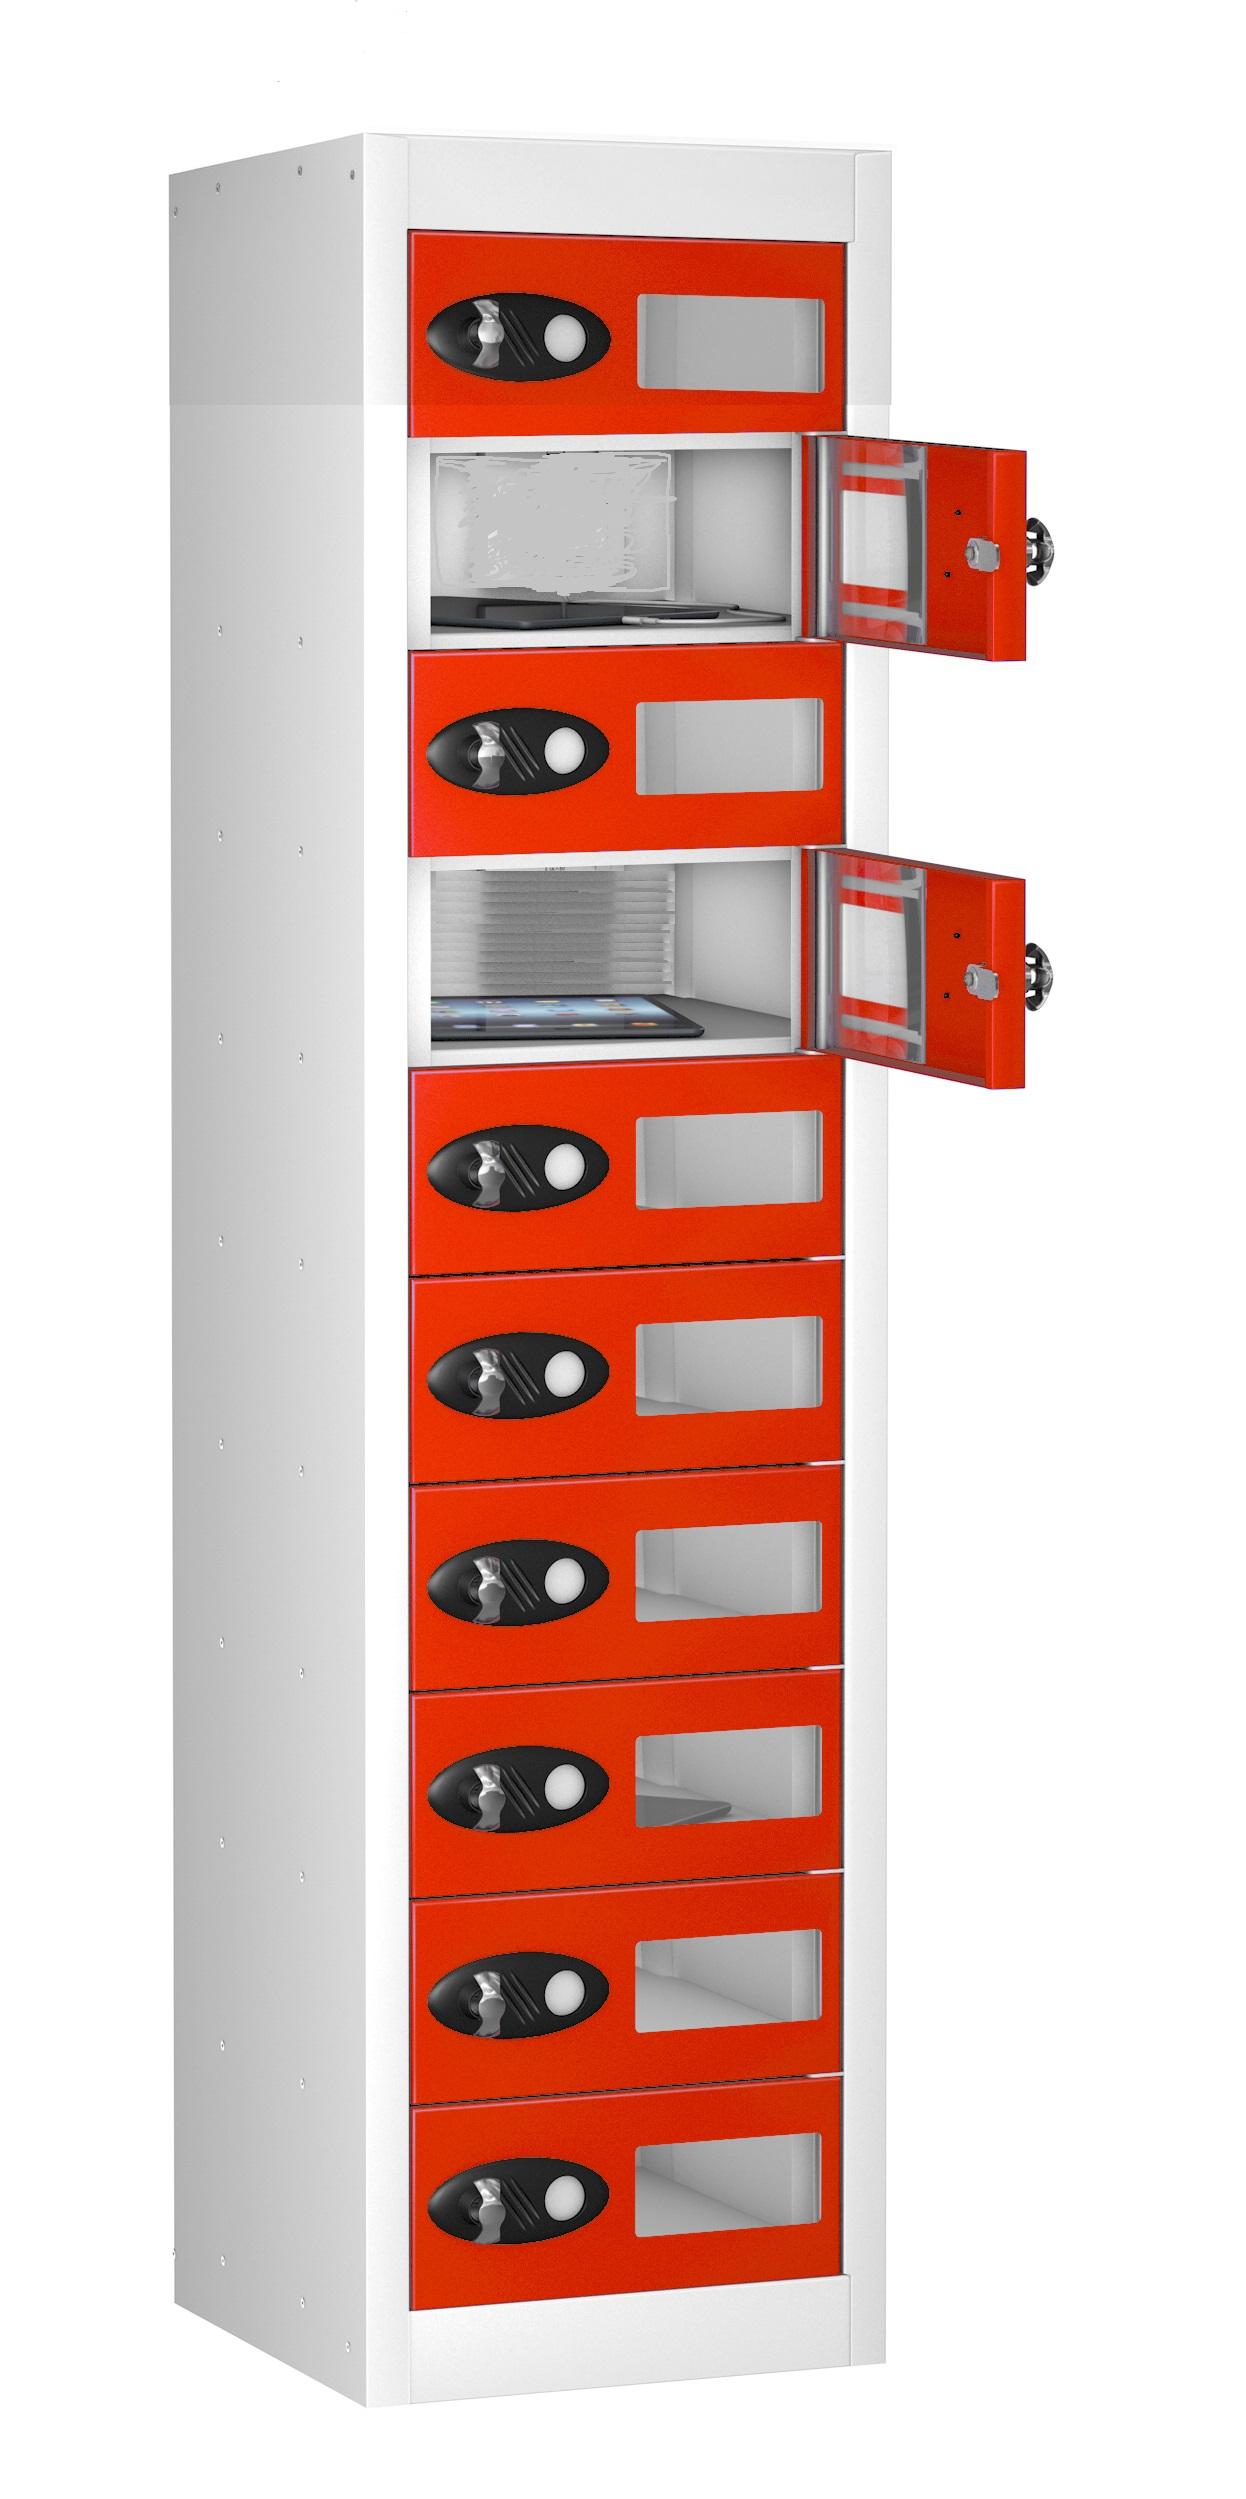 VISION PANEL TABLET Storage Locker -10 Doors (Non Charging)